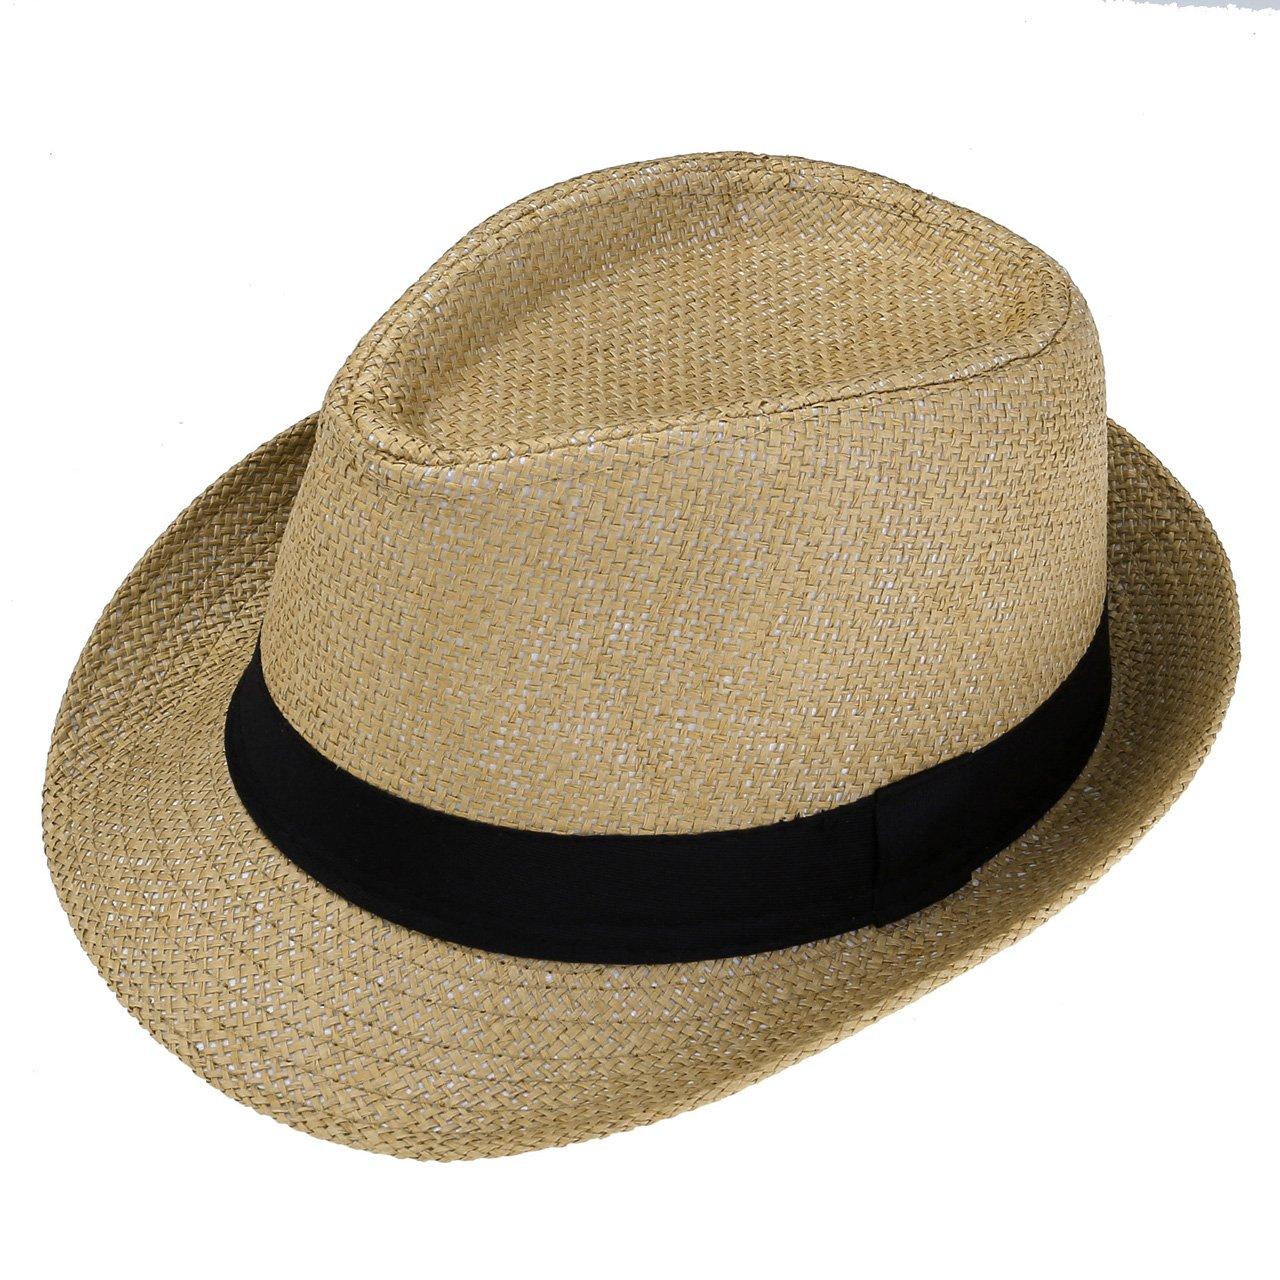 Faleto Unisex Summer Panama Straw Fedora Hat Short Brim Beach Sun Cap Classic (#01 Khaki)